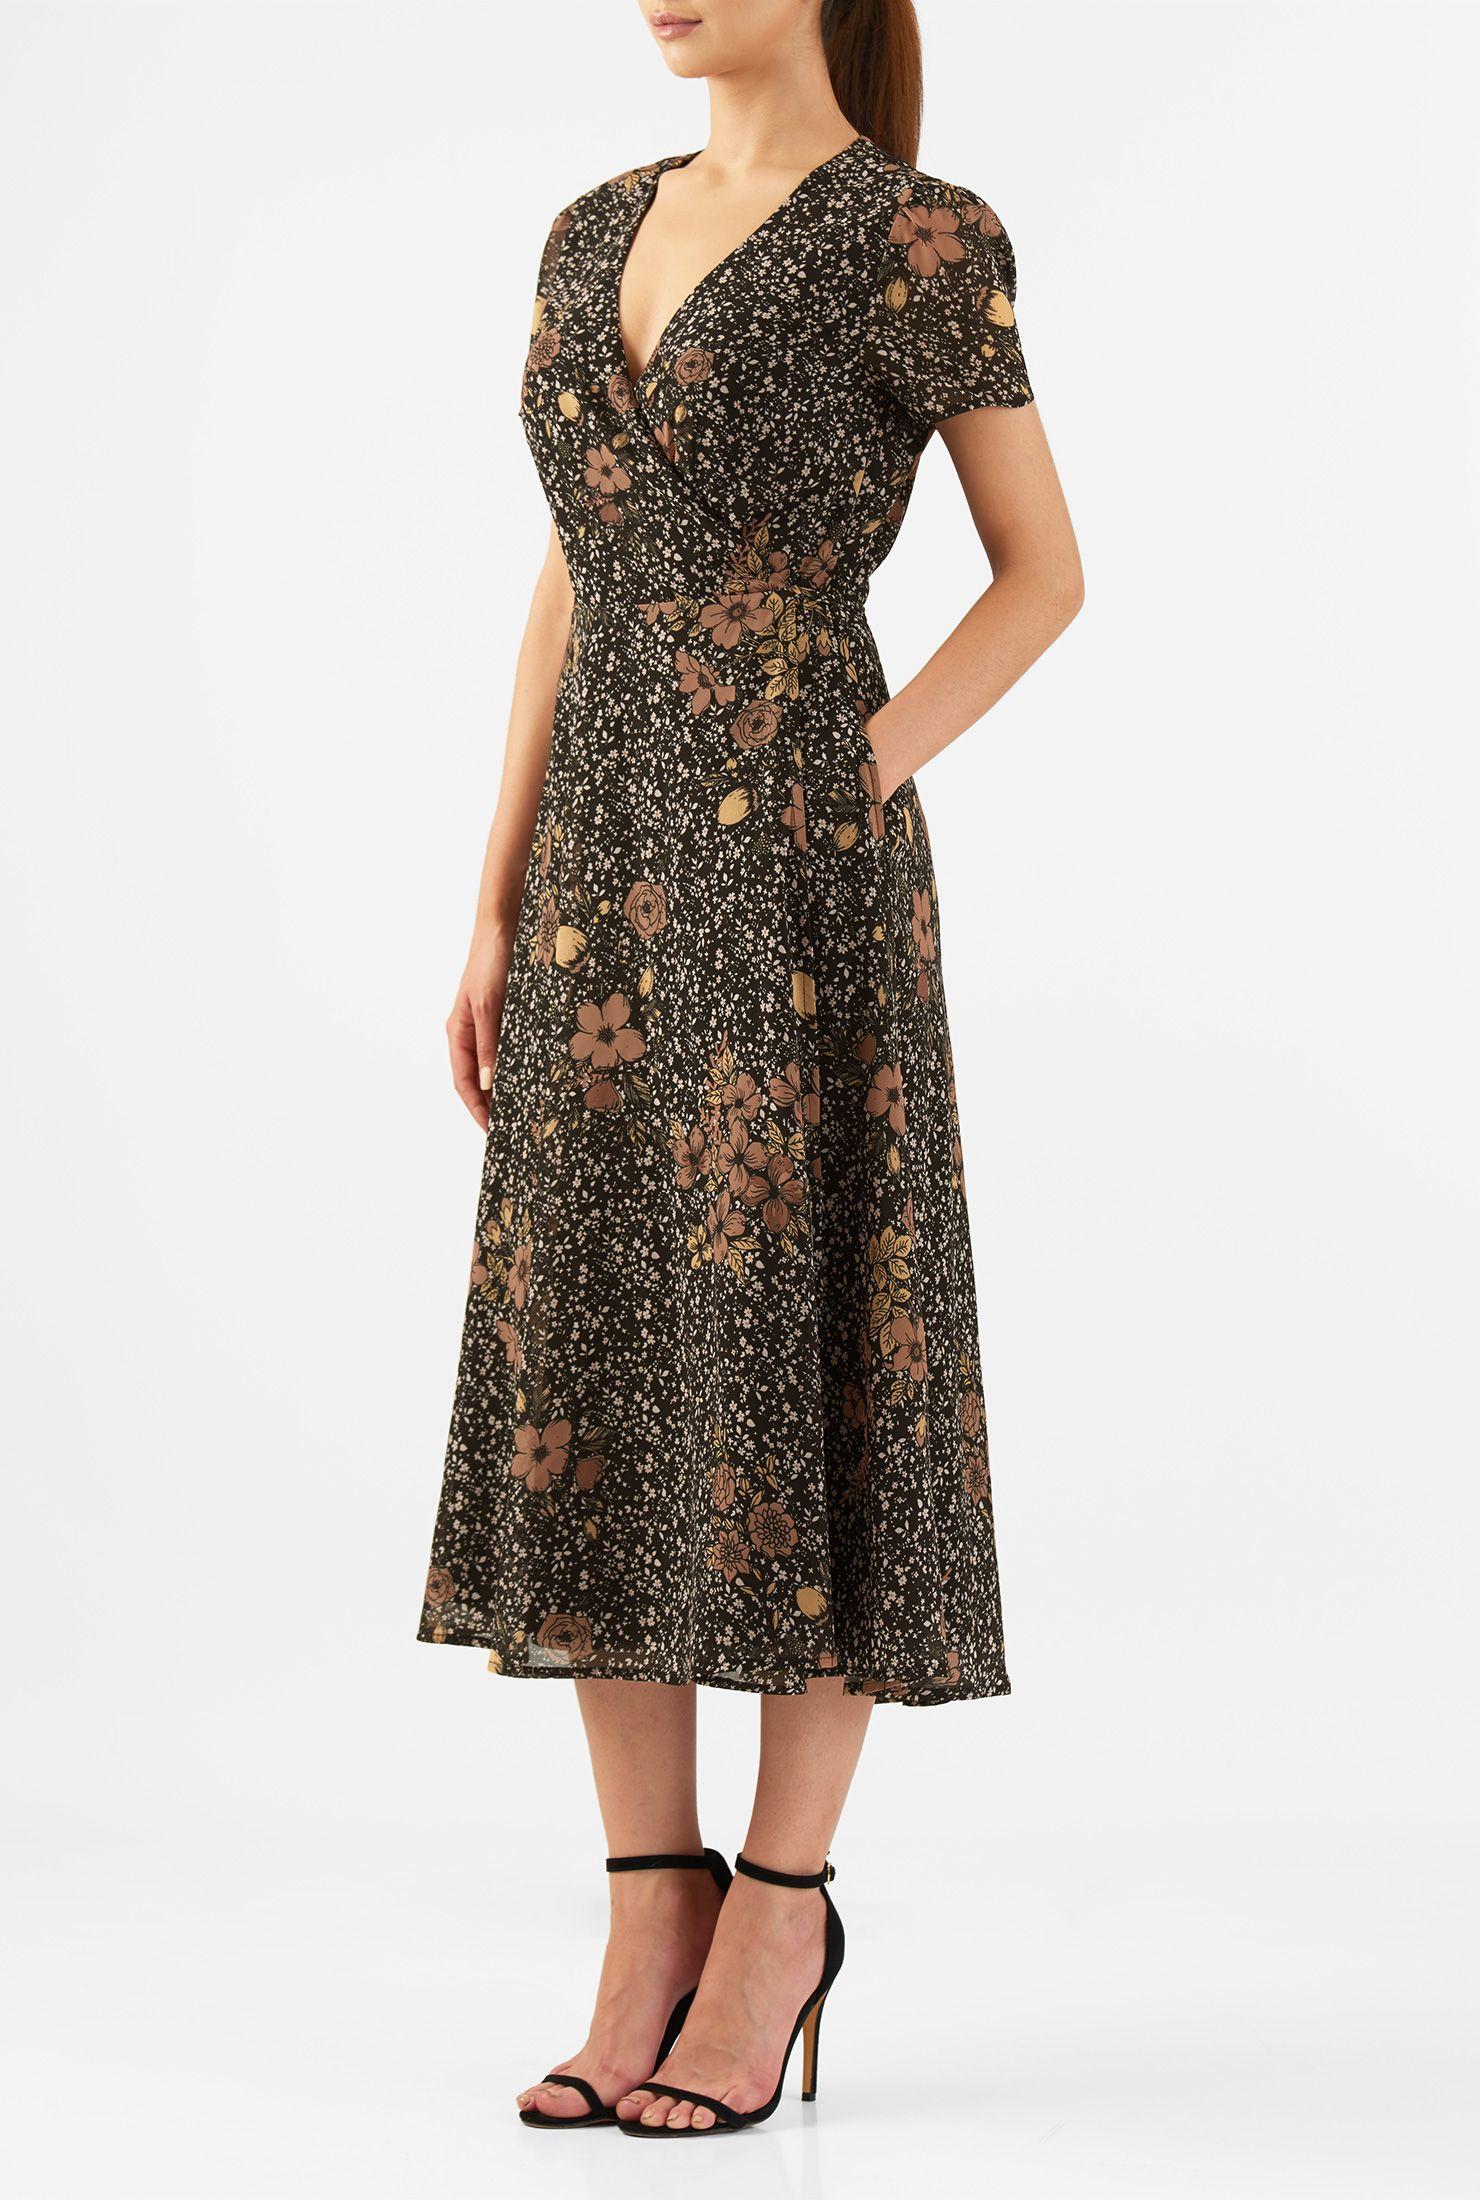 Black Dresses Floral Print Dresses Lightweight Dresses Machine Wash Dresses Mid Calf Length Dresses Midi Dres Beautiful Dress Designs Wrap Dress Dresses [ 2200 x 1480 Pixel ]